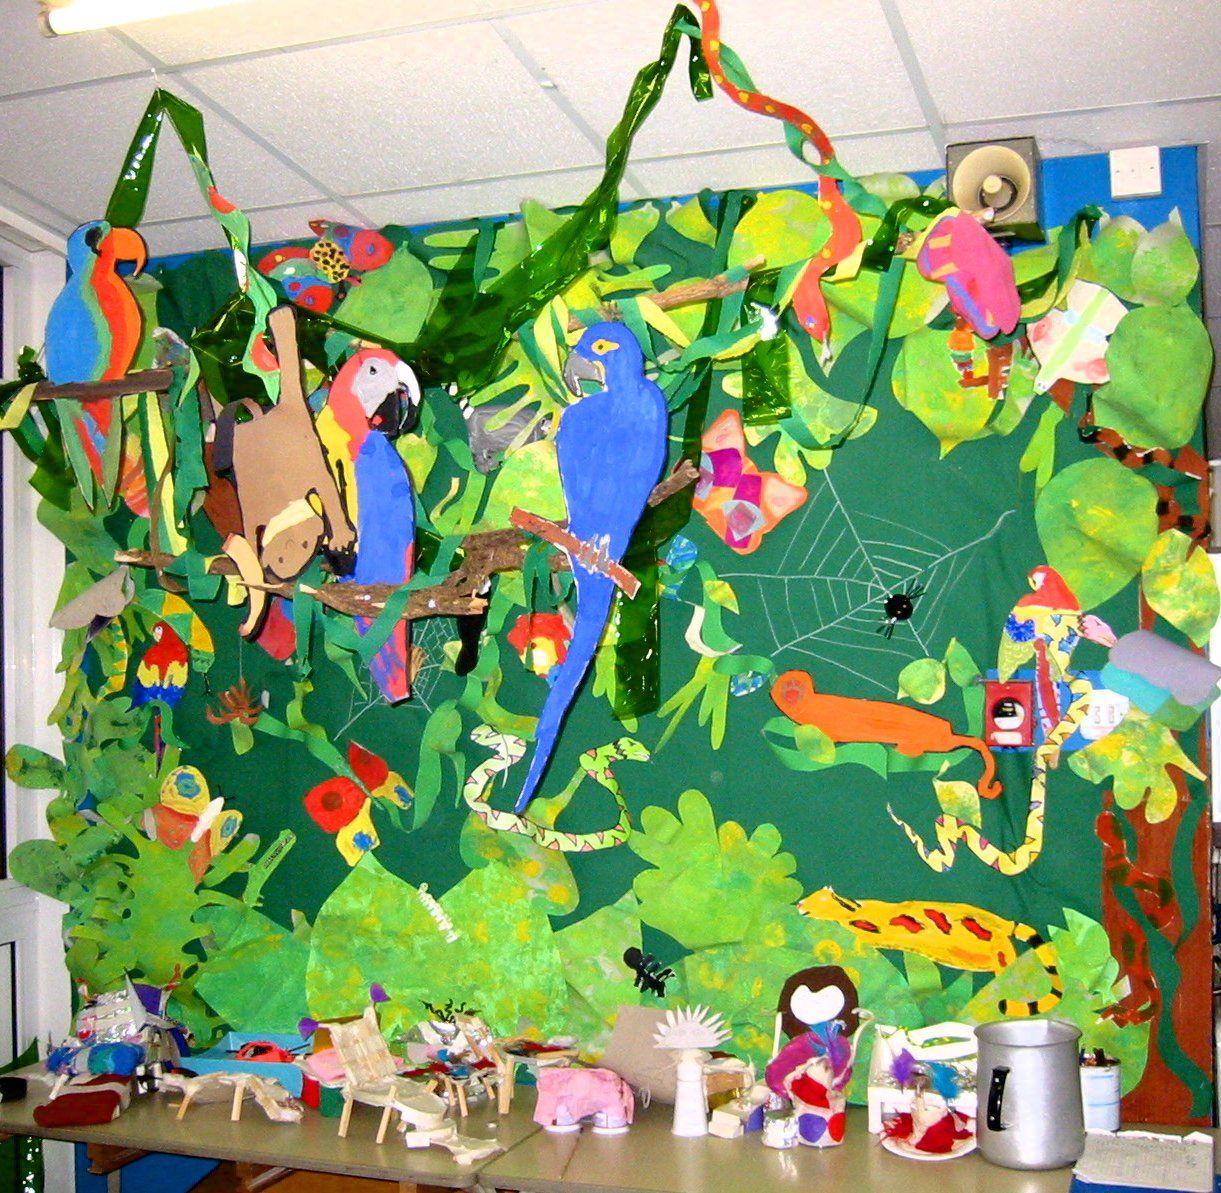 Rainforest Art Ideas For Primary School